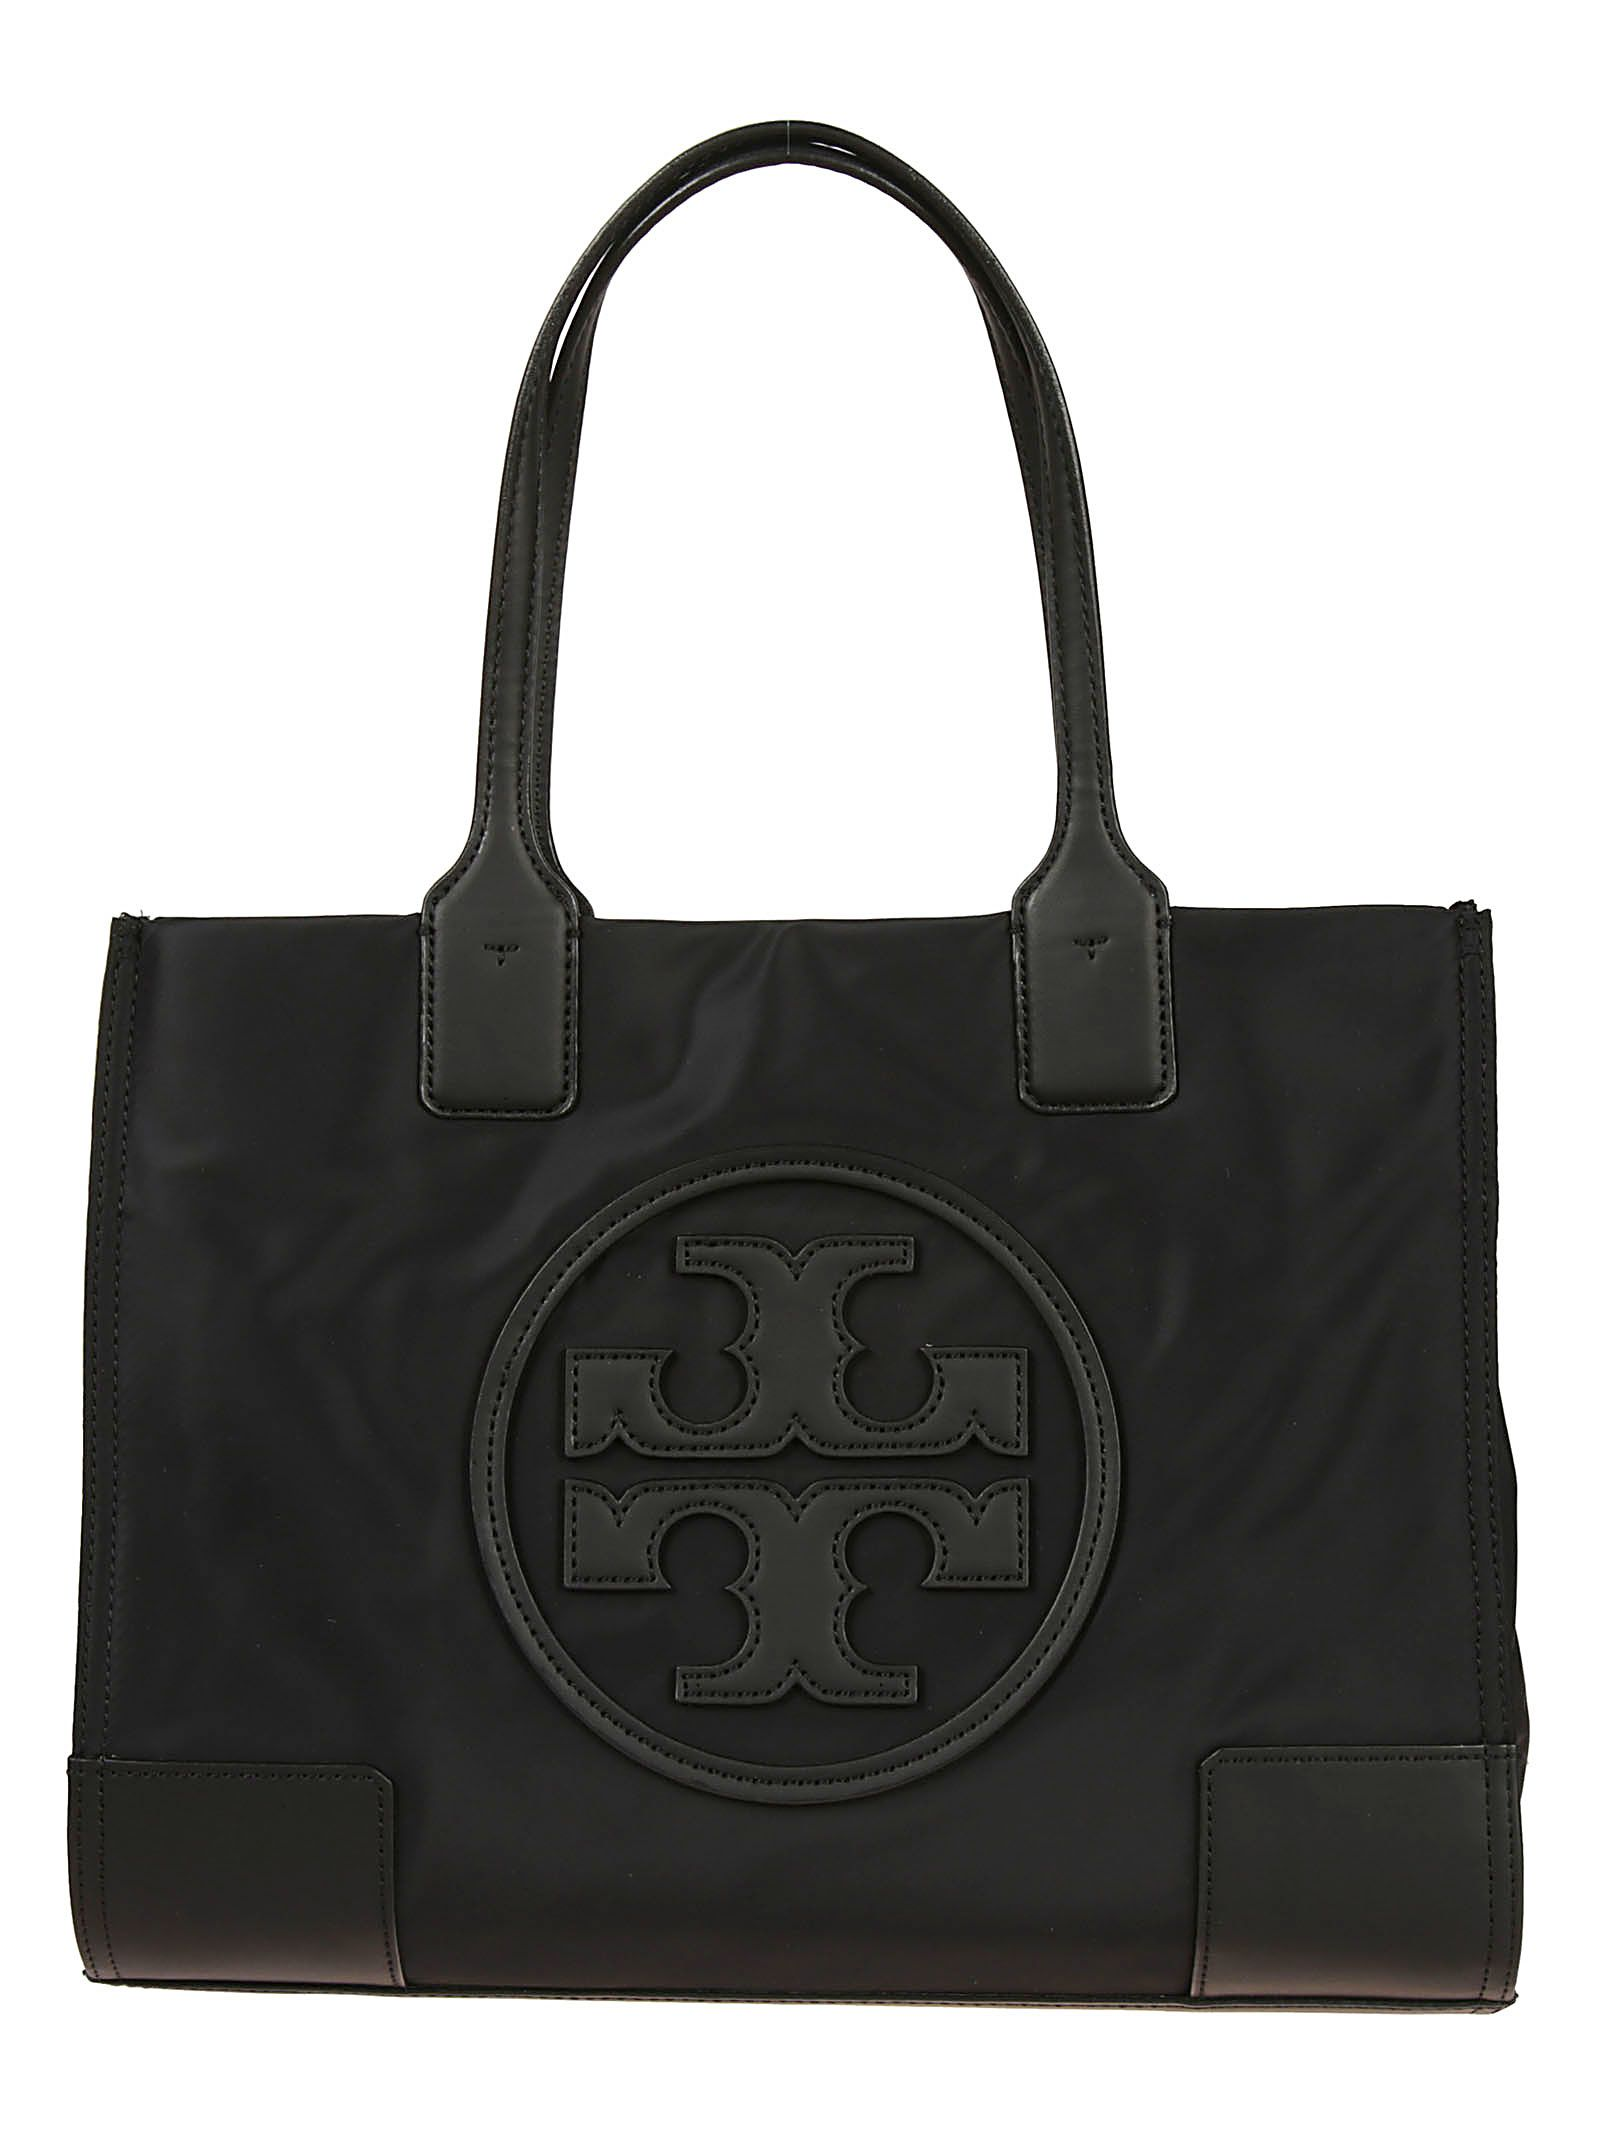 908667e838b Tory Burch Black Nylon Ella Tote Bag